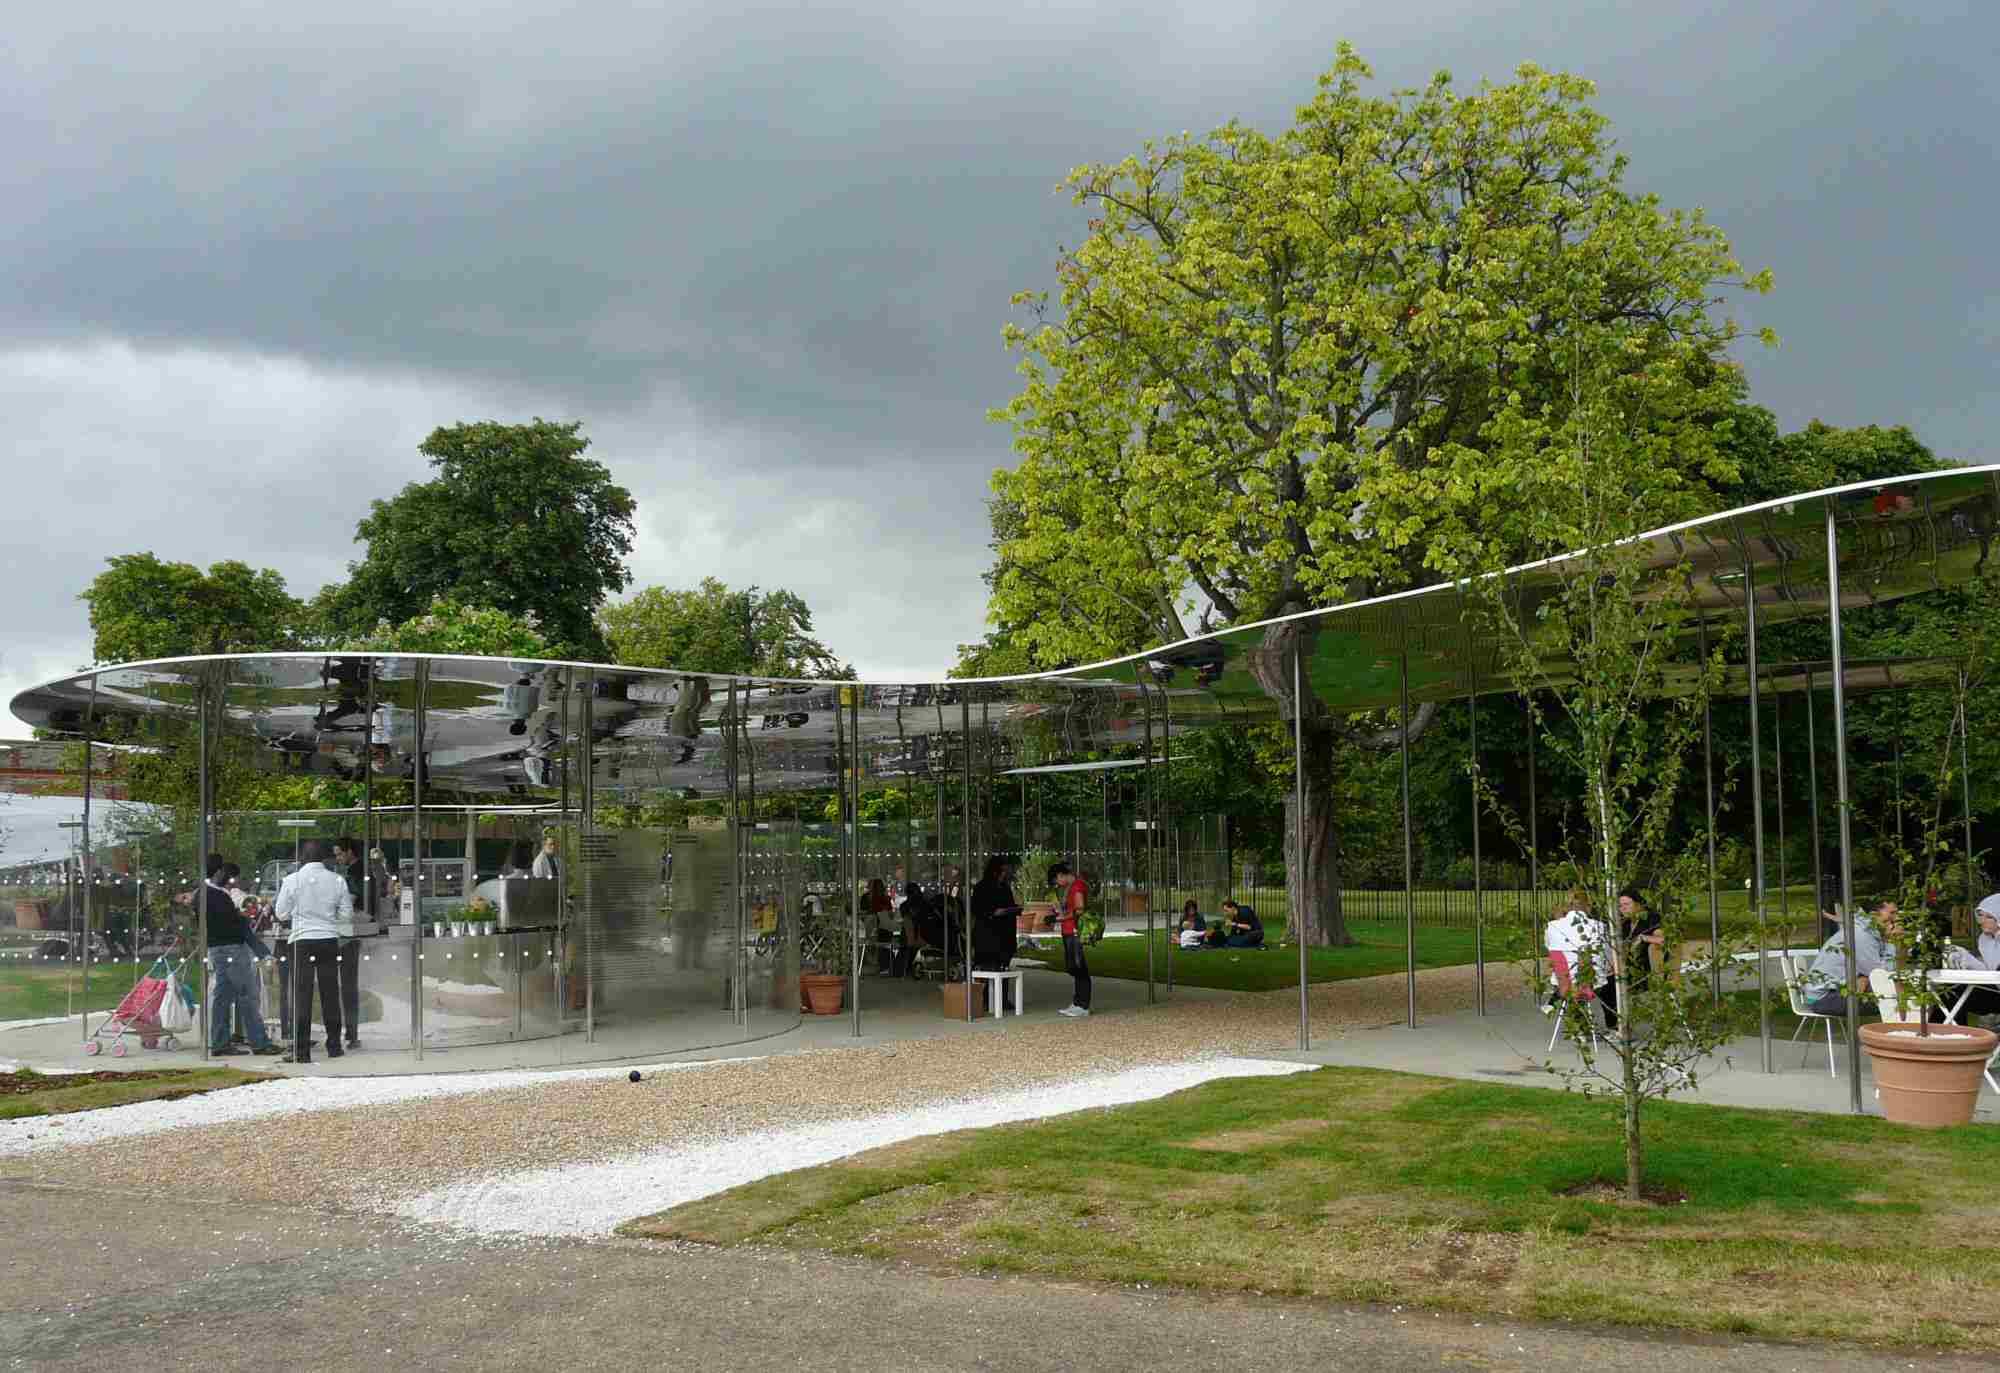 Serpentine Gallery Pavilion 2009 by Kazuyo Sejima and Ryue Nishizawa SANAA